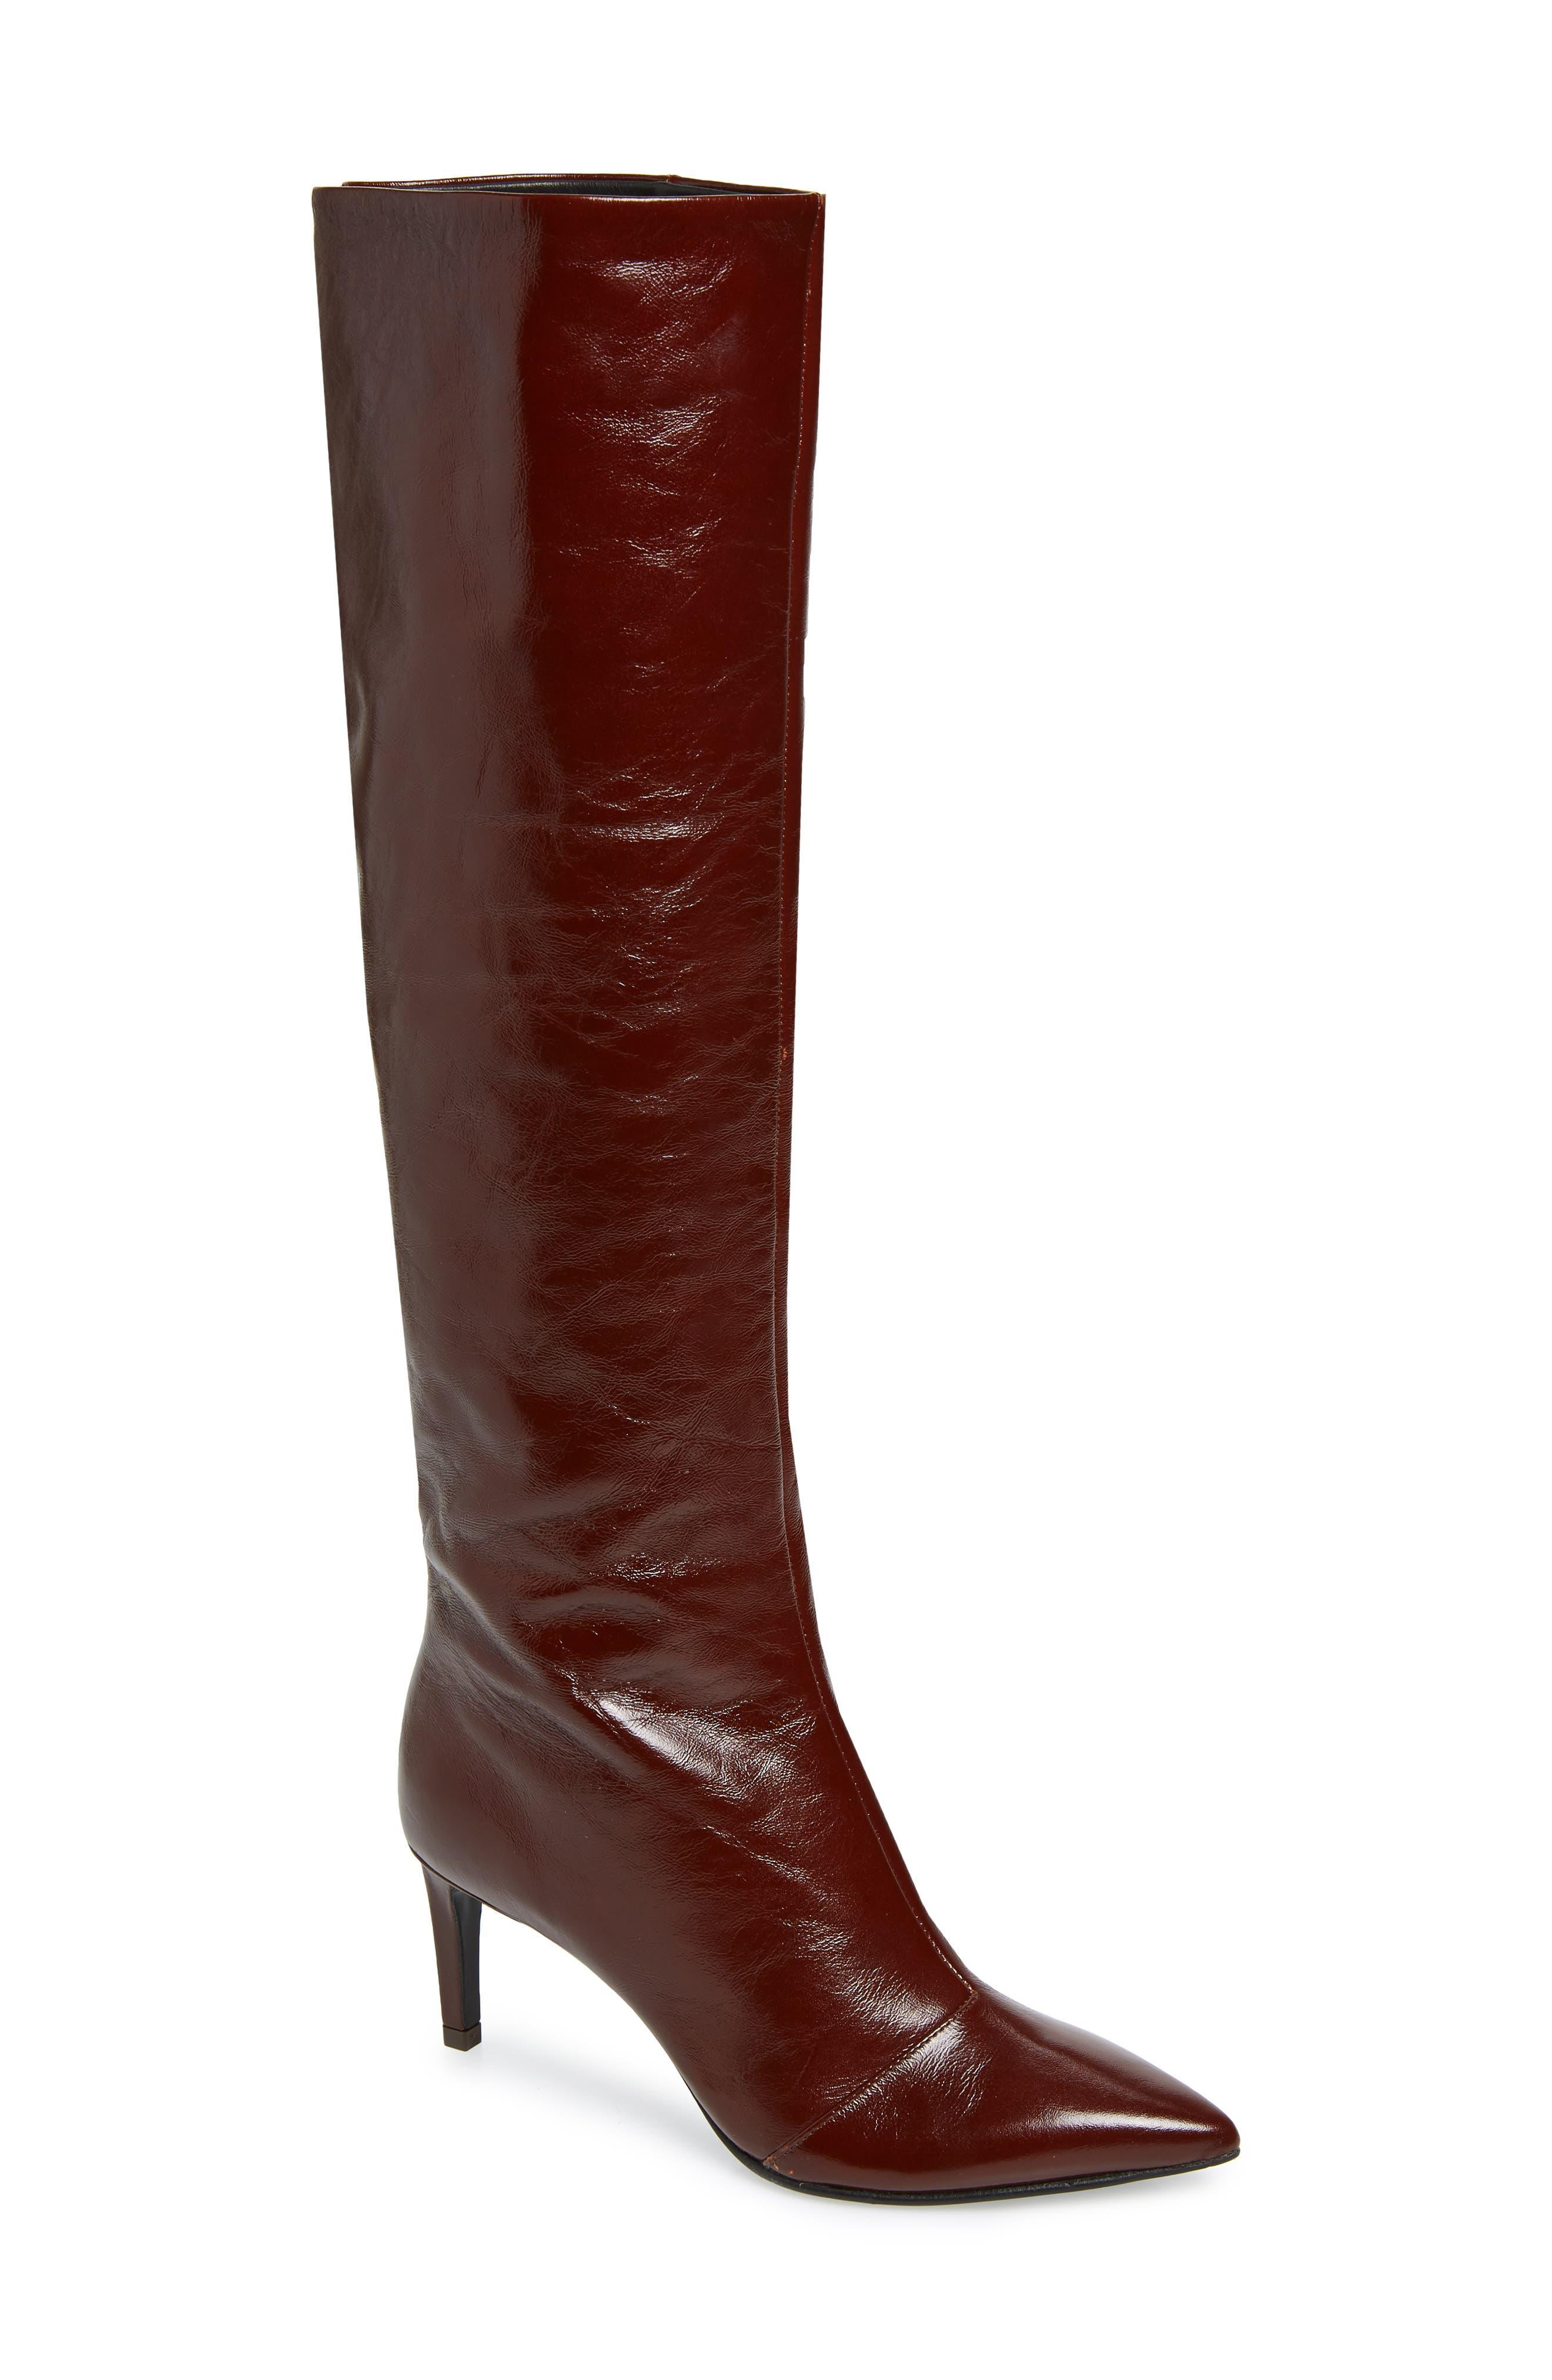 Rag & Bone Beha Knee High Boot, Brown